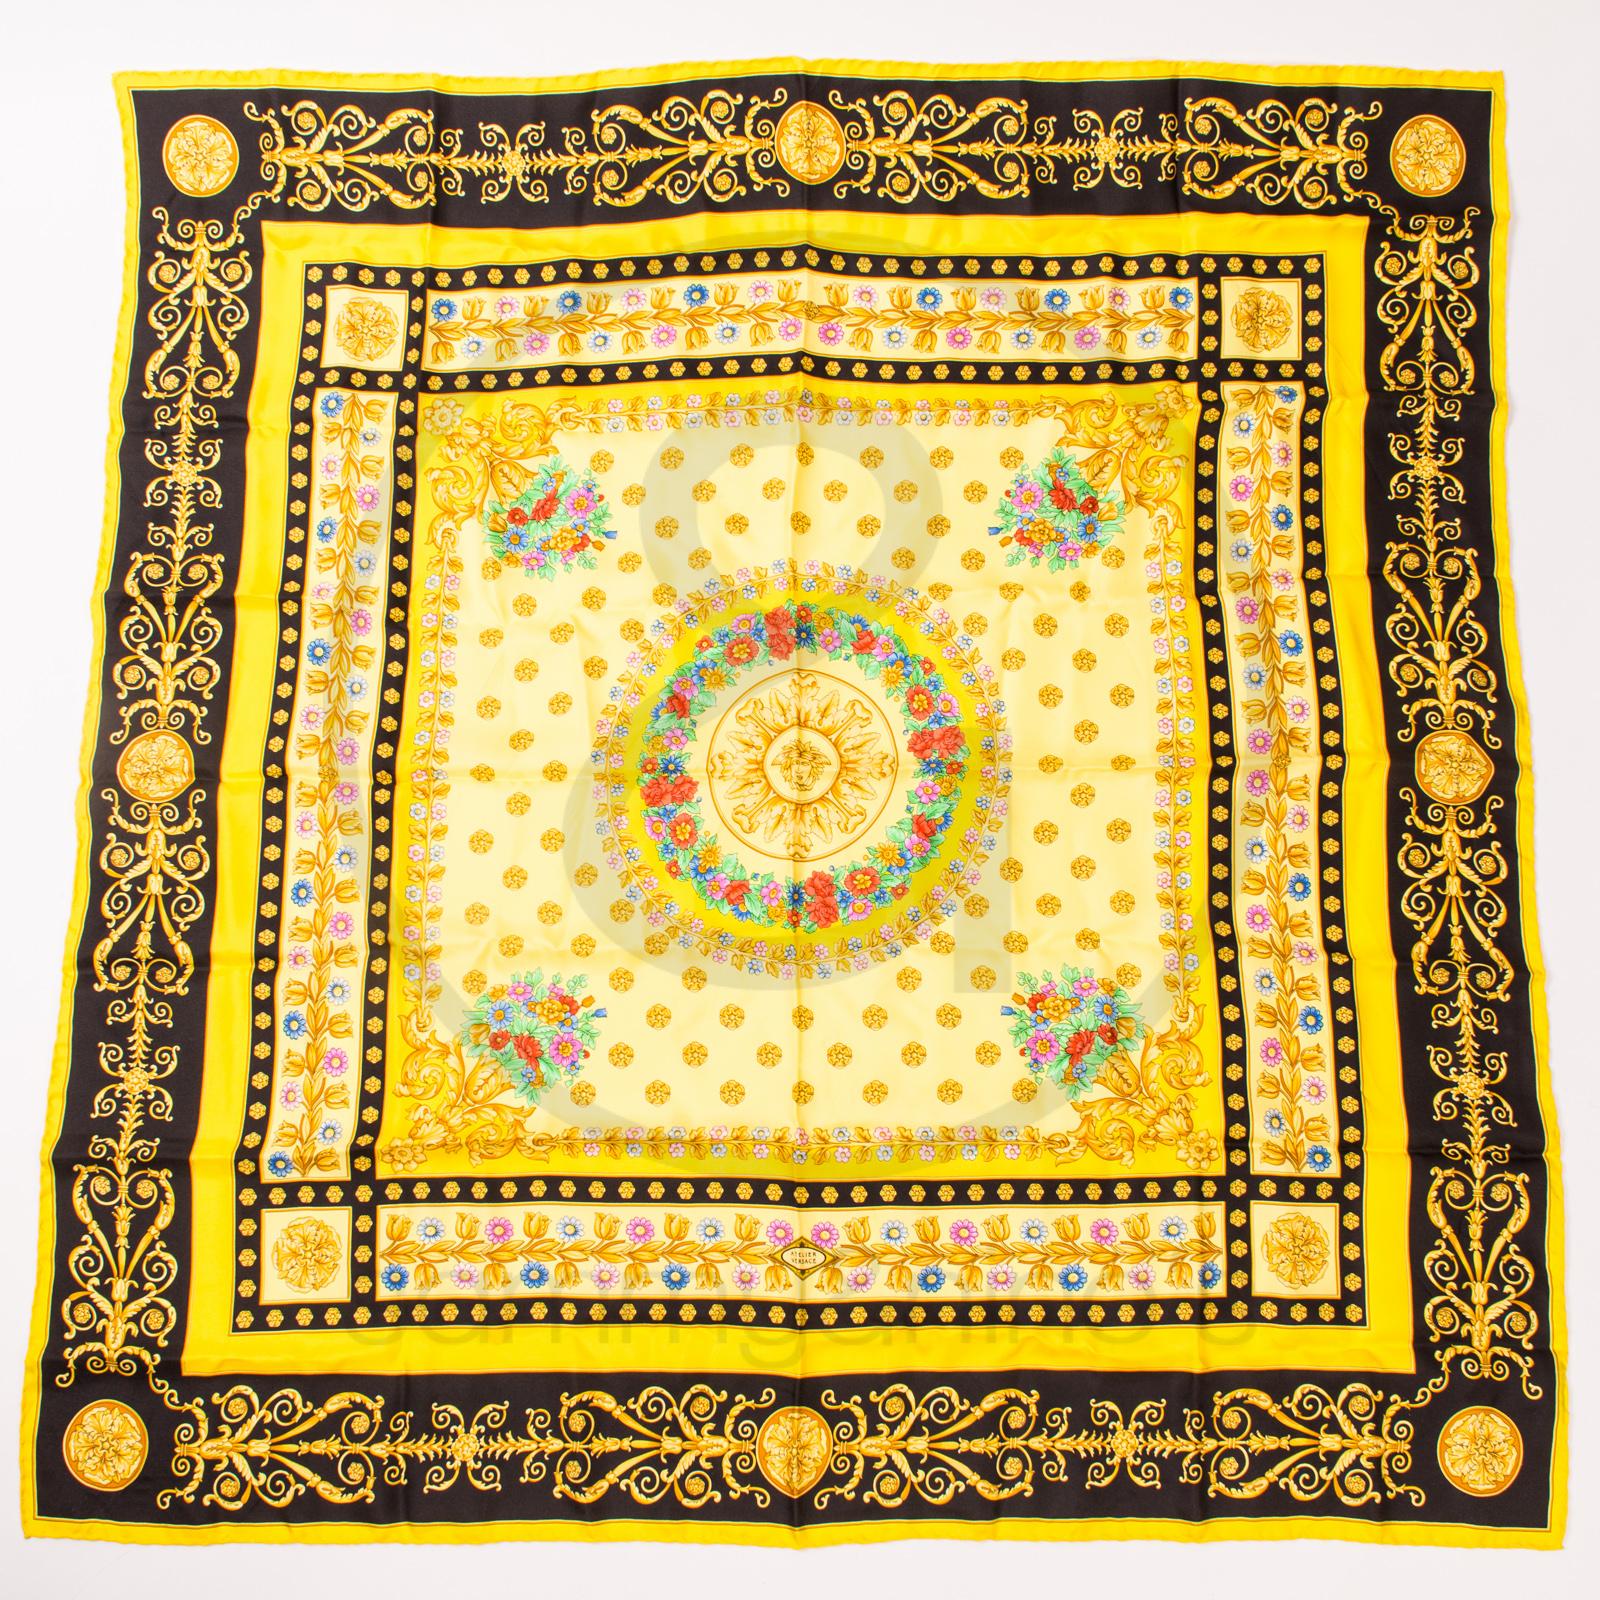 Gianni Versace silk foulard scarf – Sammy & Nino's Store